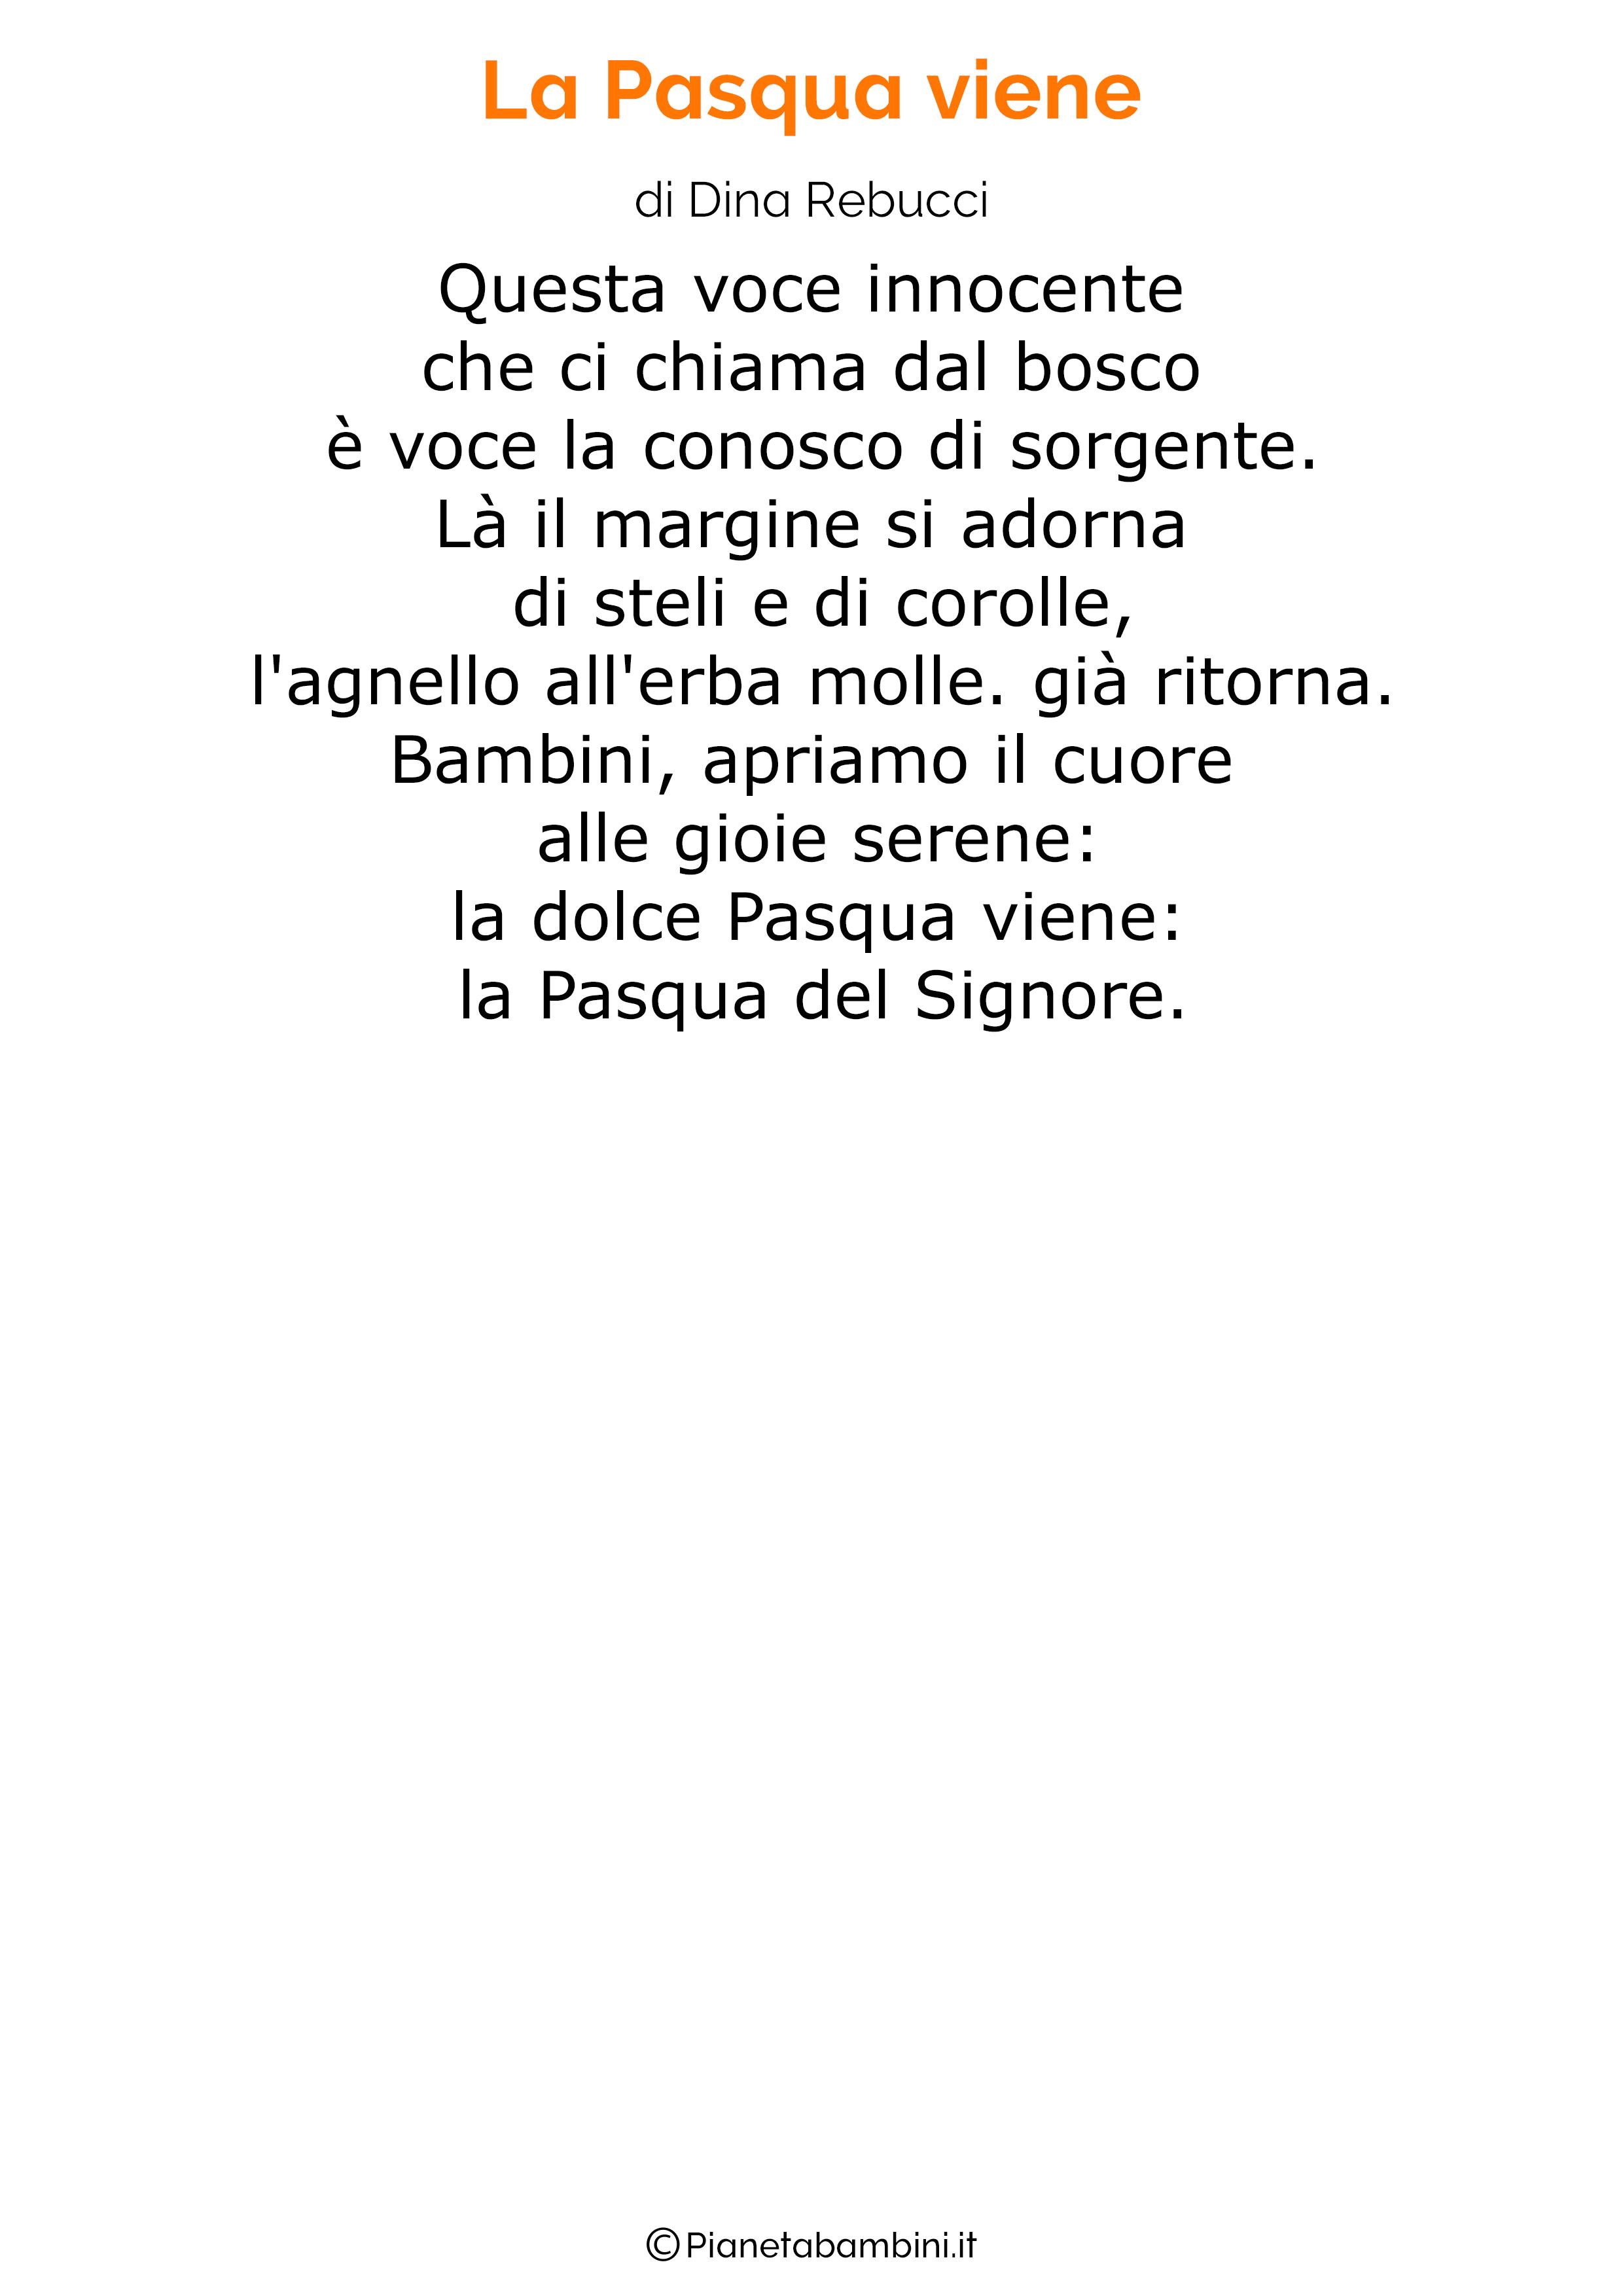 Poesia di Pasqua 23